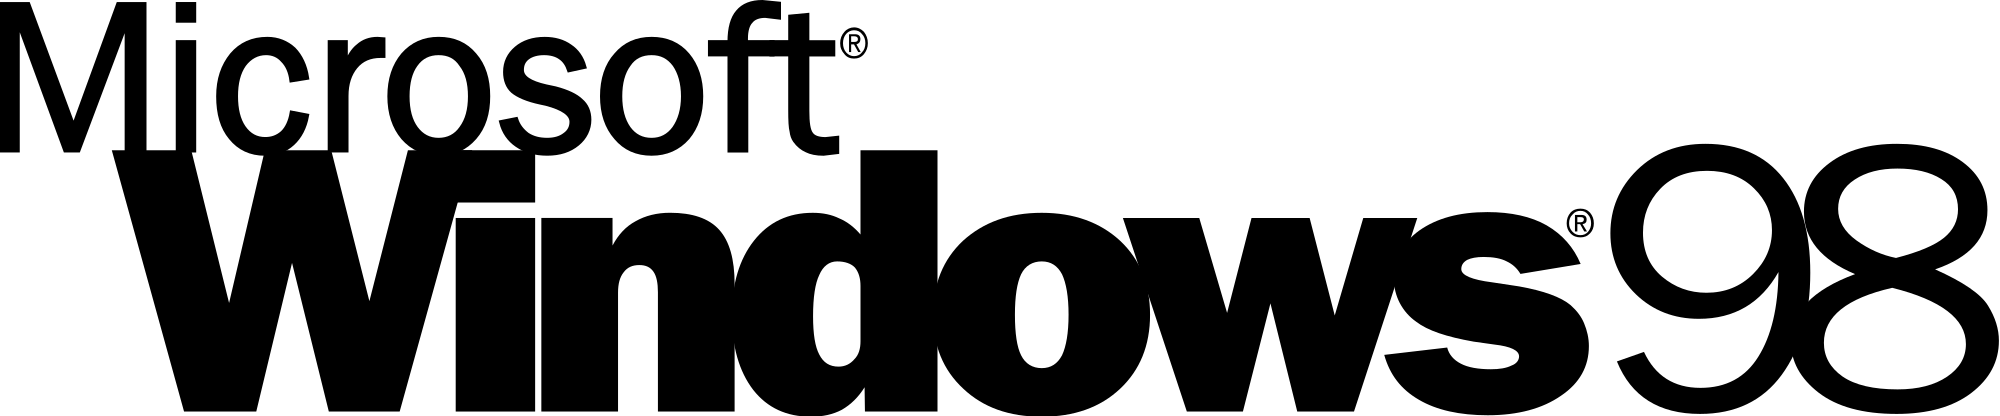 Windows 98 png. File logo svg wikimedia